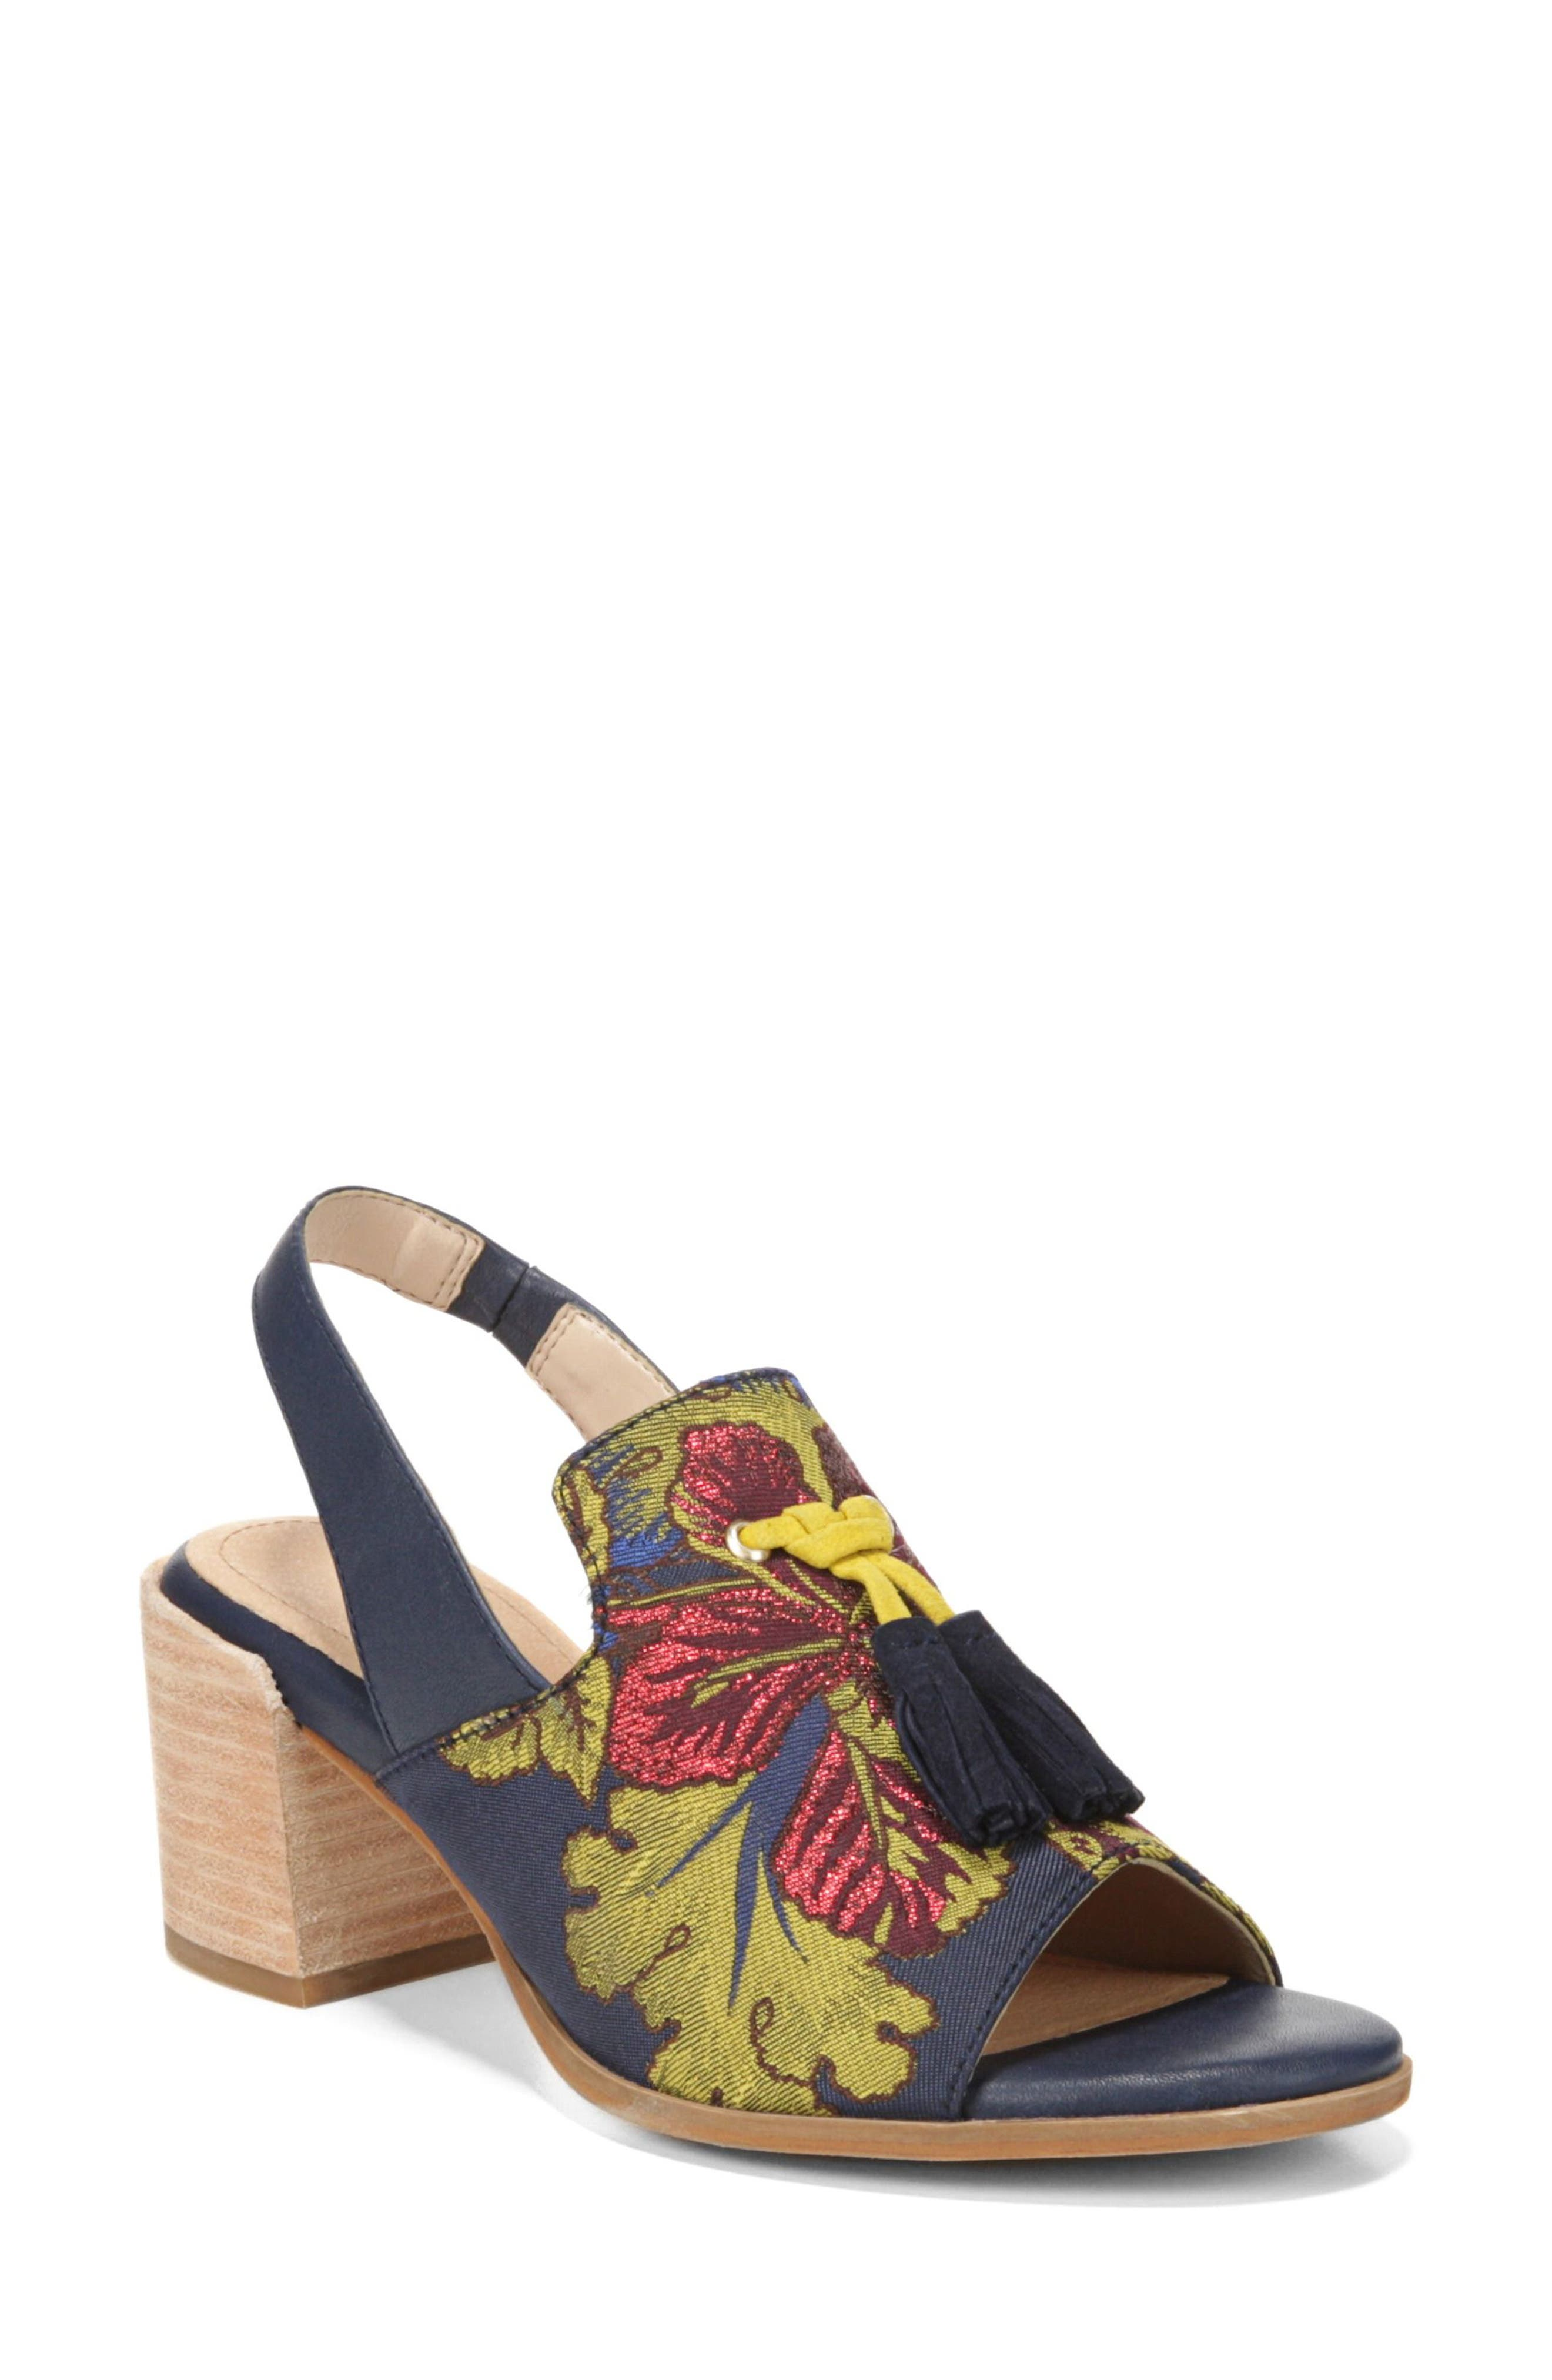 Meko Slingback Sandal,                         Main,                         color, 400